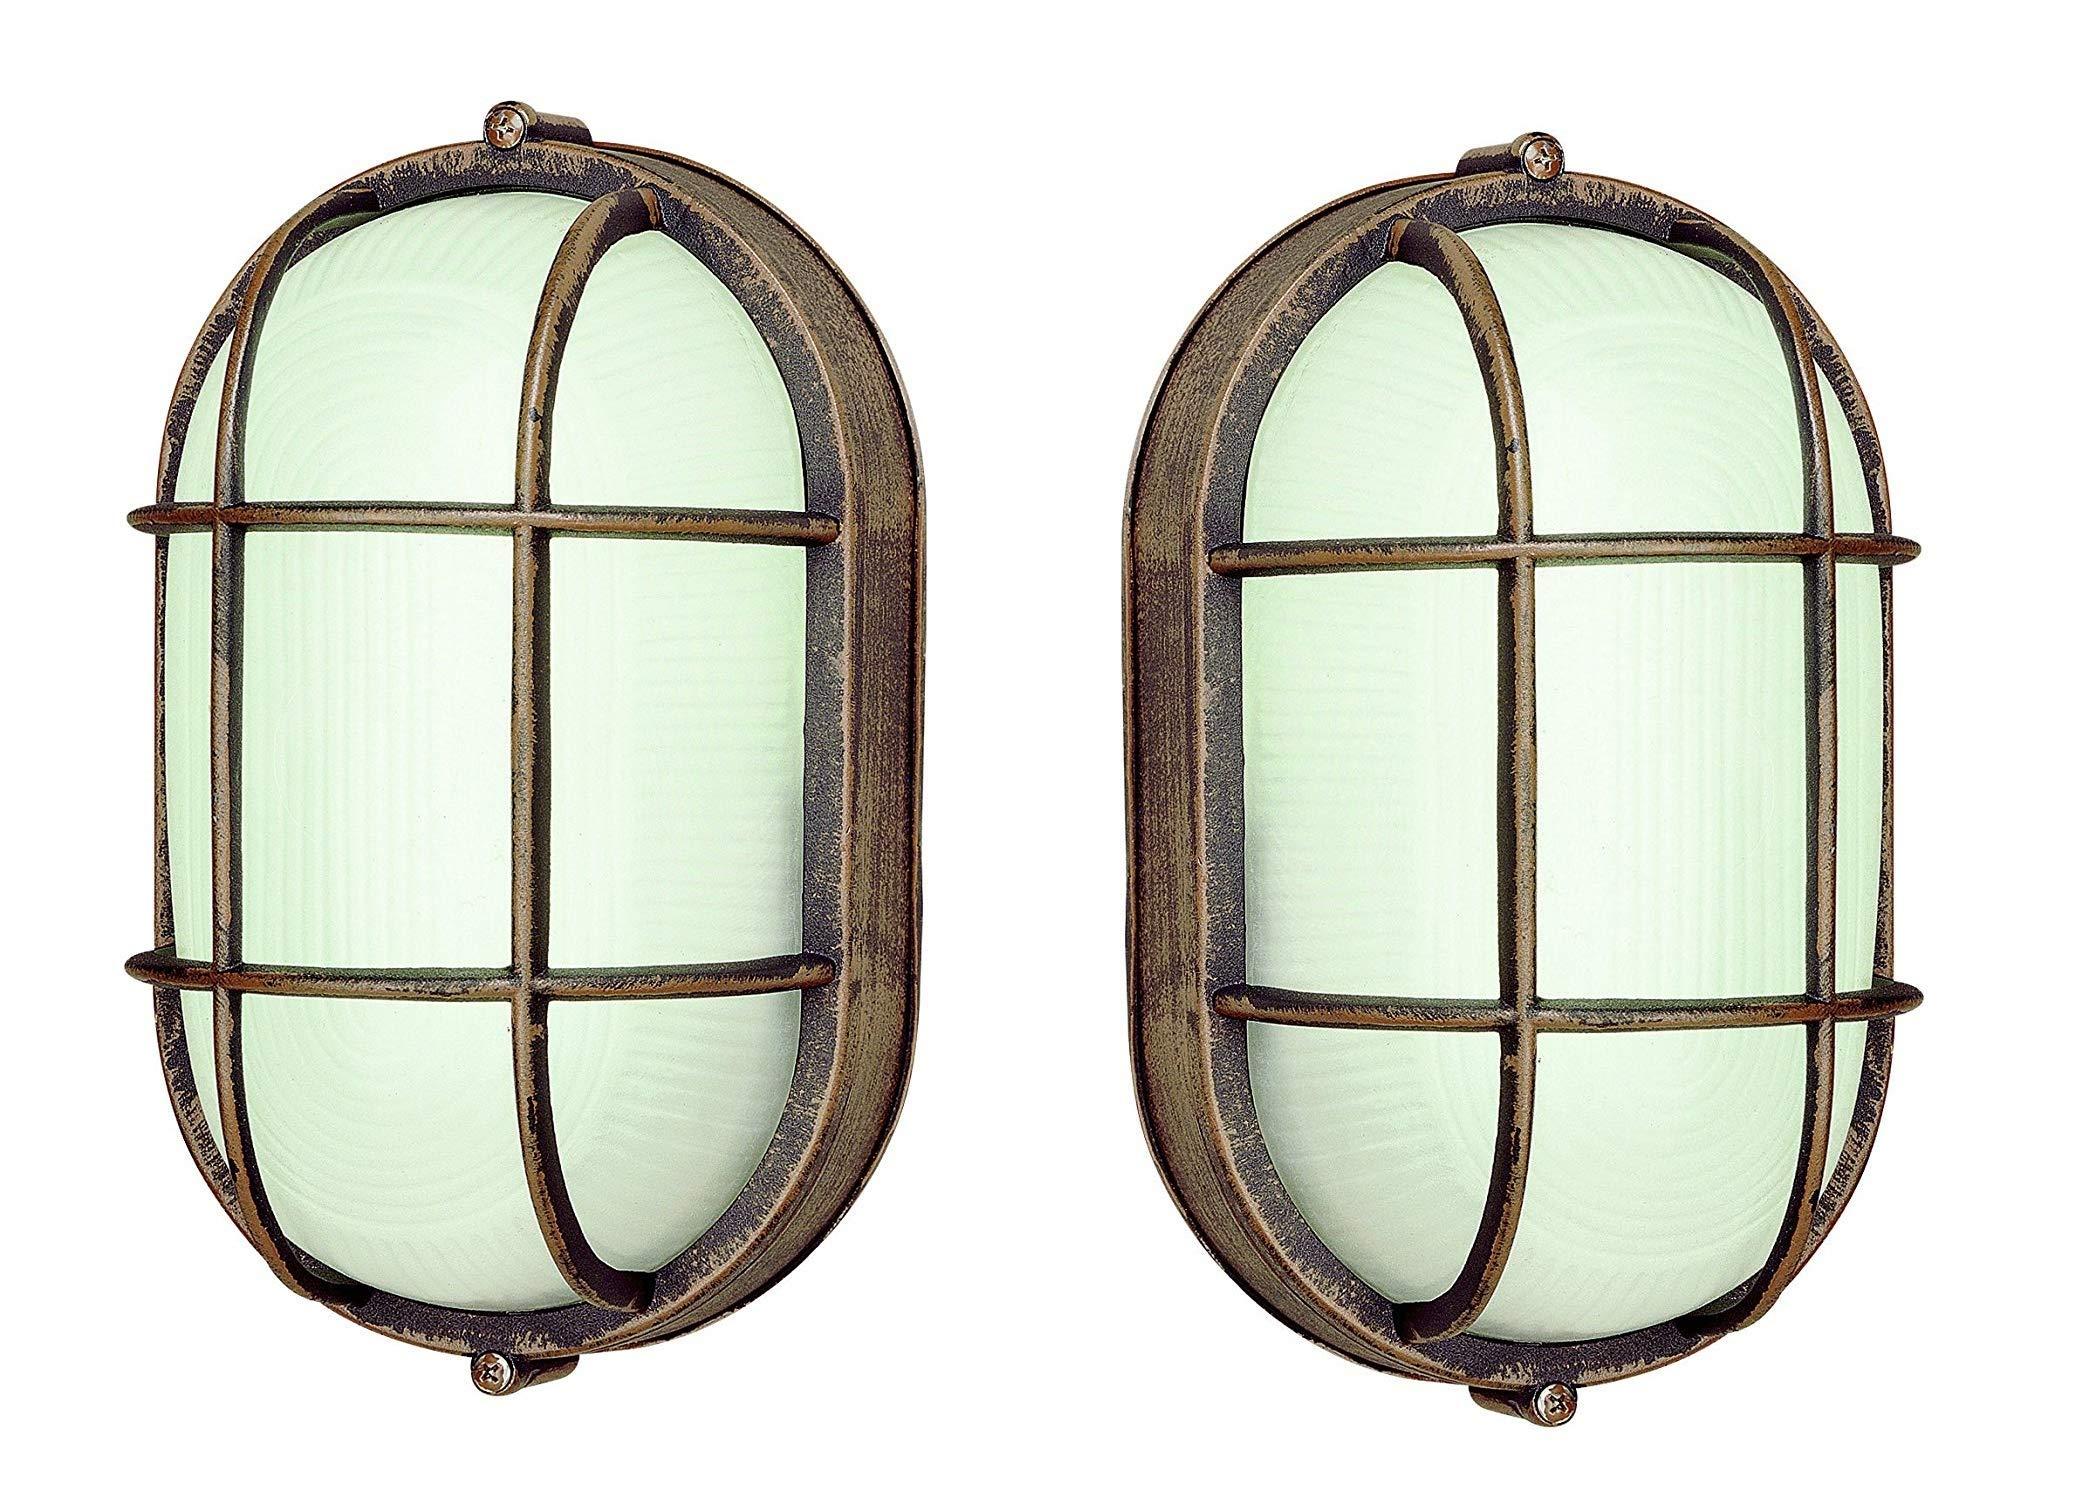 Trans Globe Lighting Outdoor Aria 8.5'' Bulkhead, Rust - 2 Pack